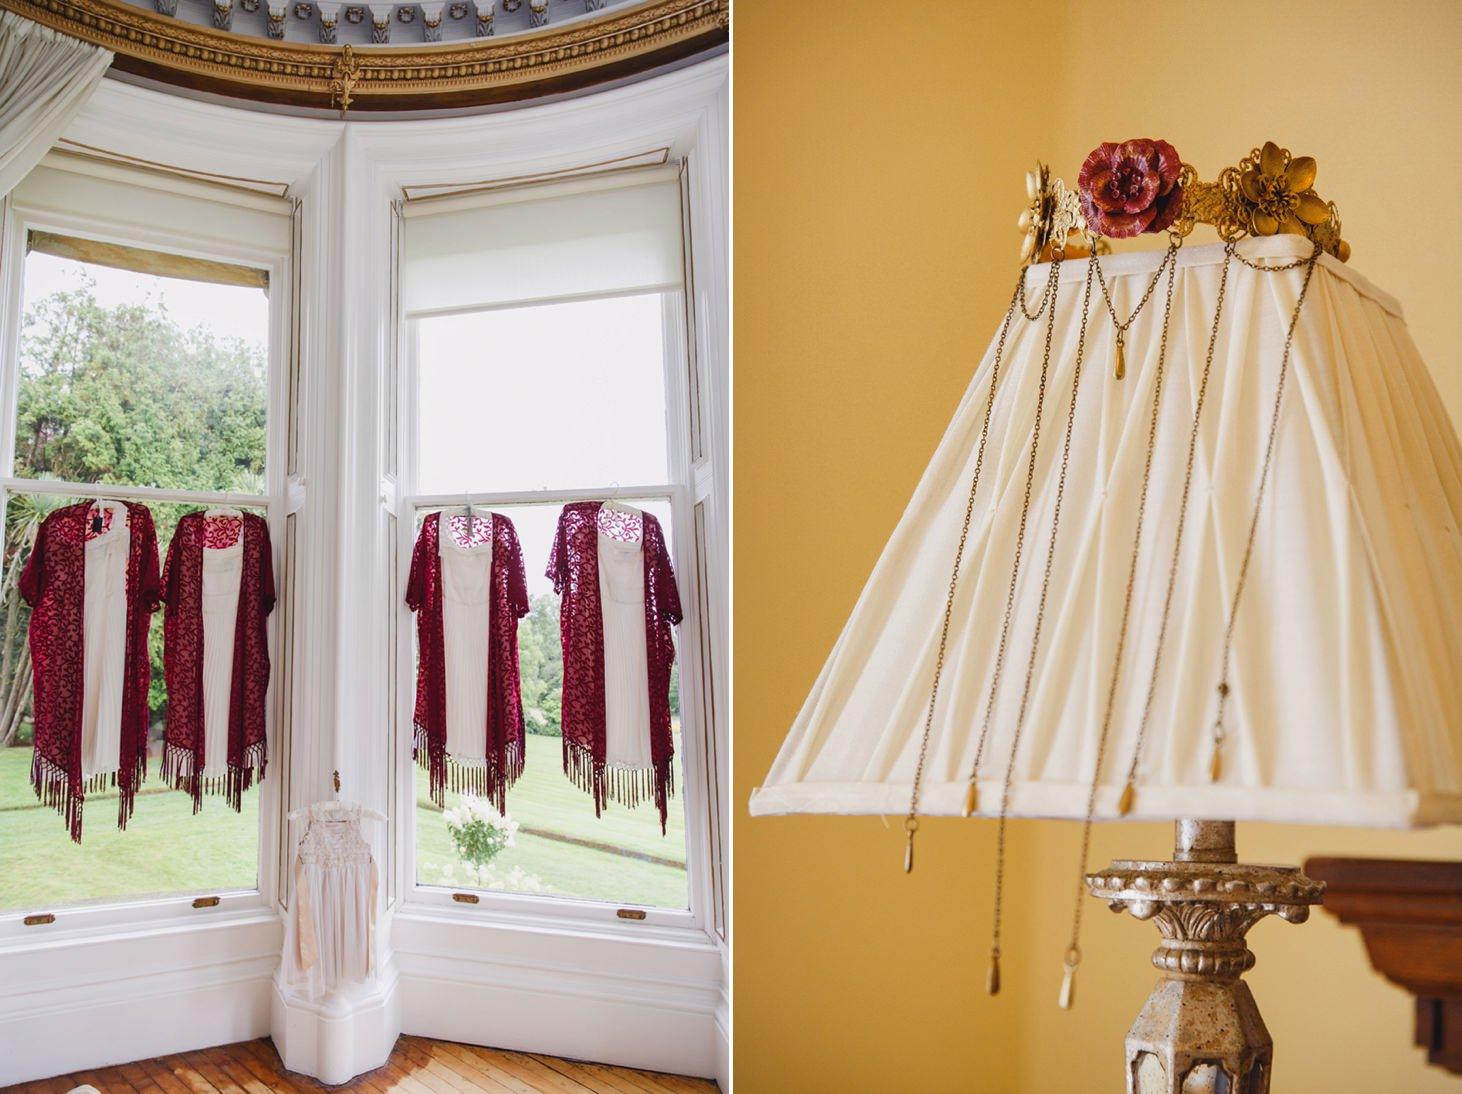 mount stuart wedding photography bridesmaids dresses and crown